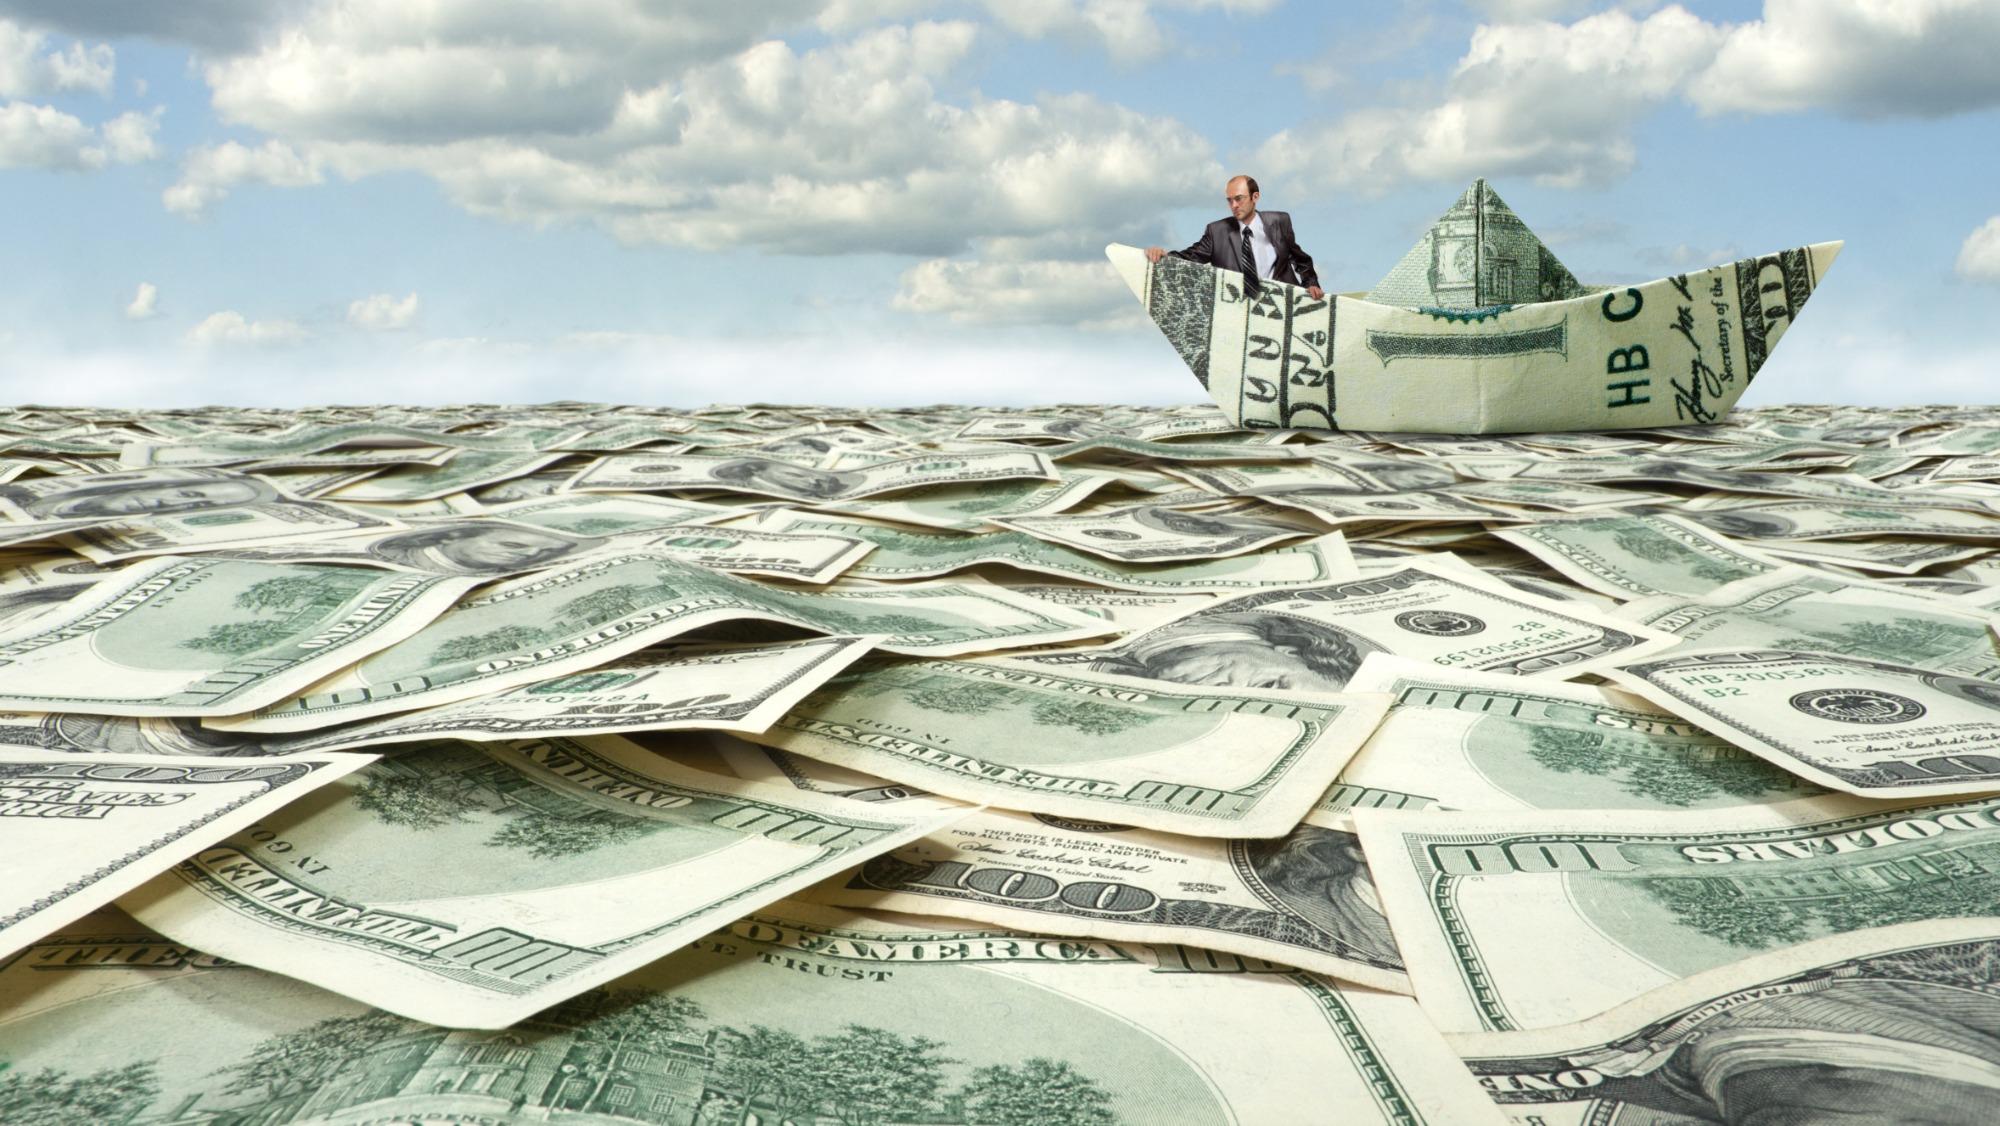 A rising sea of money